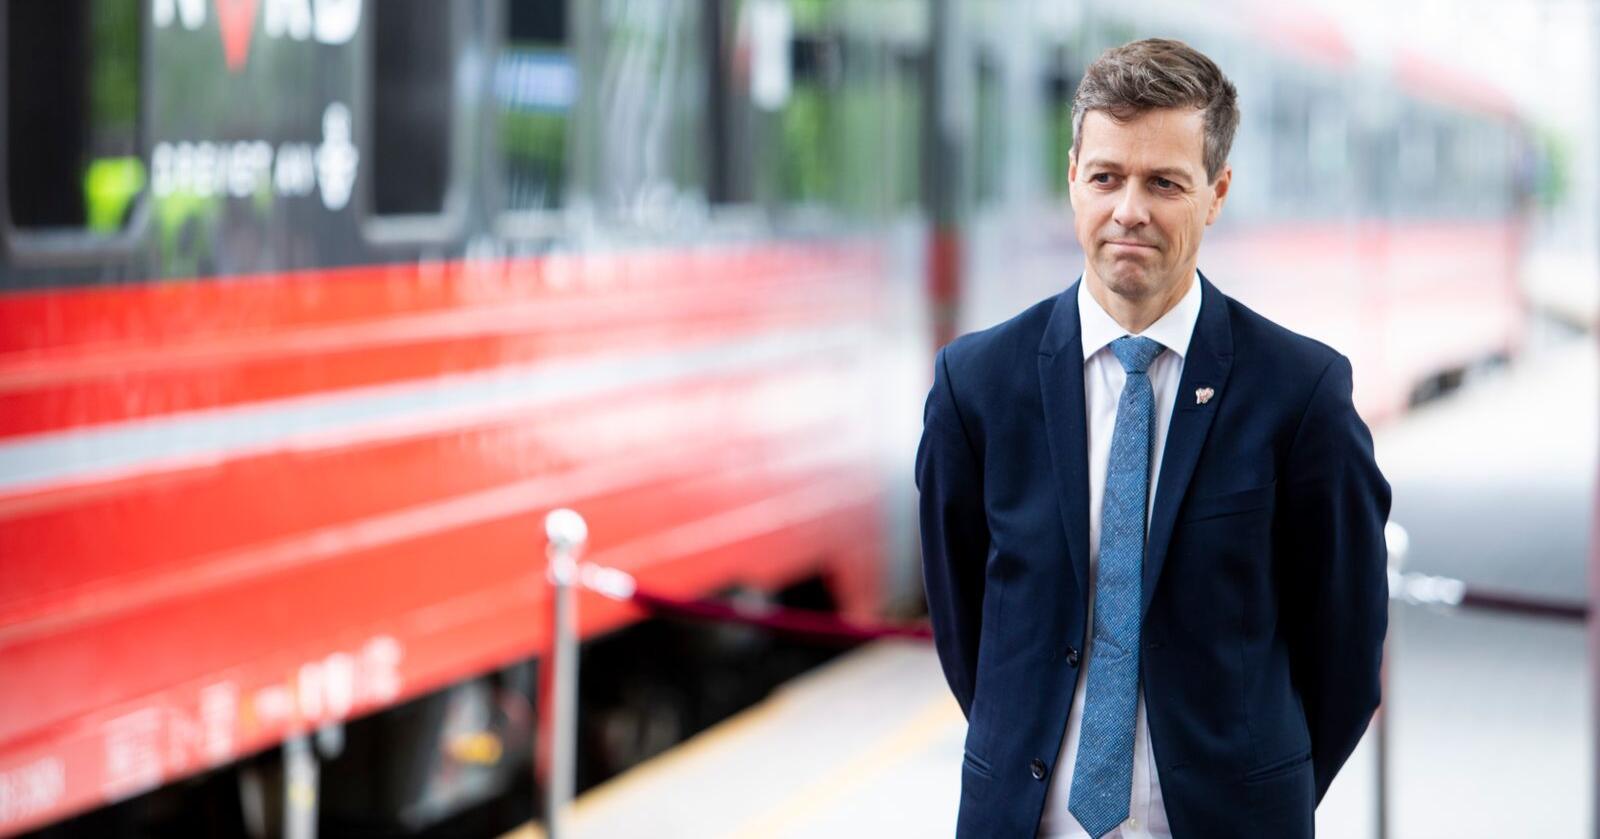 Samferdselsminister Knut Arild Hareide konkluderer med at noen tog må stå på tomgang frem til nye togparkeringer er på plass. Foto: Tore Meek / NTB